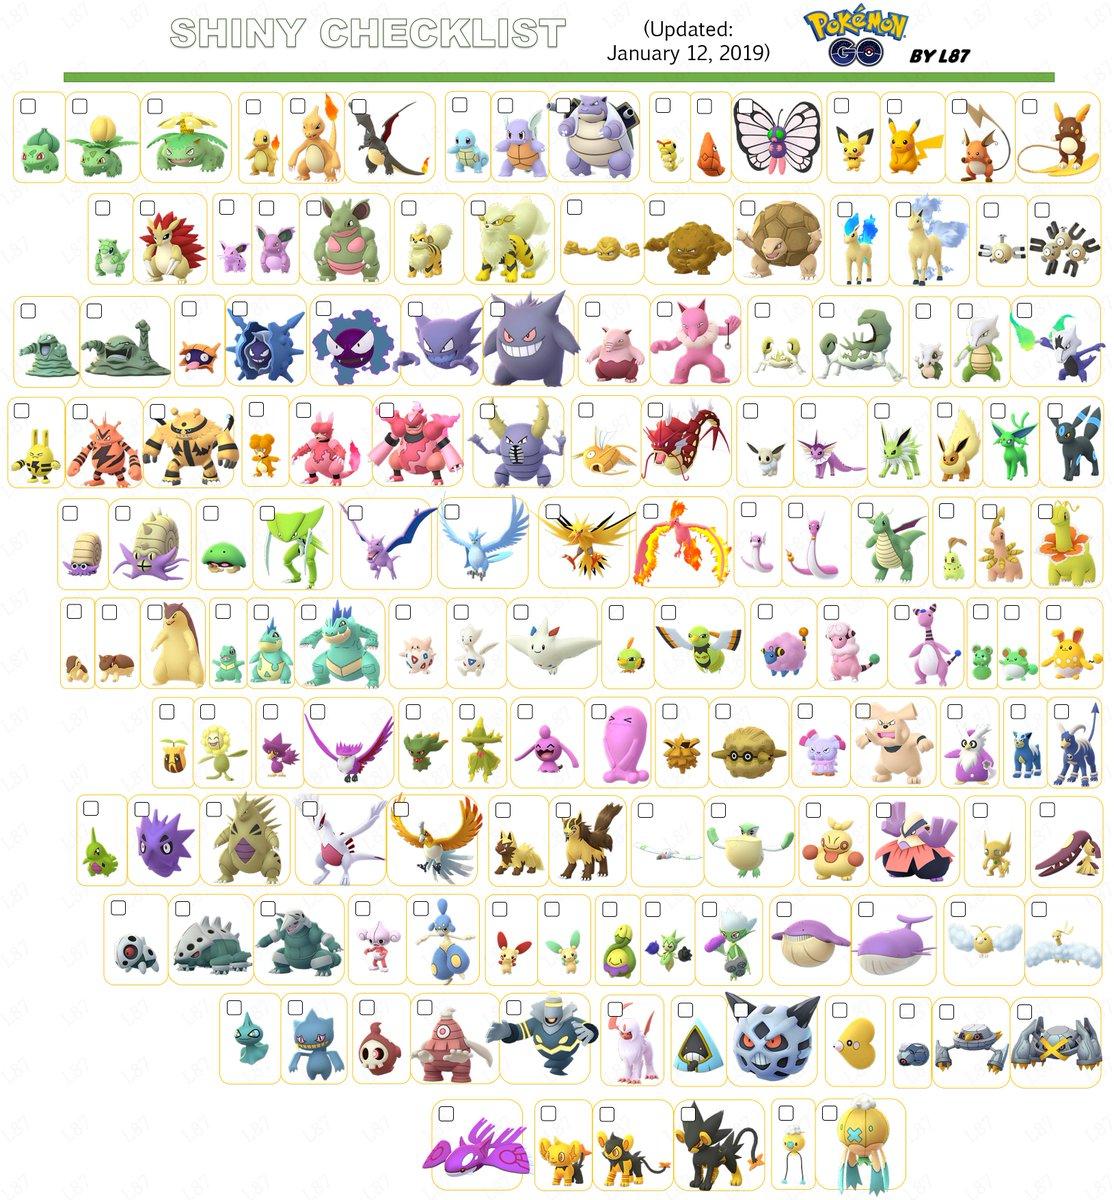 #PokemonGO #PokémonGO Updated ShinyChecklist! #Totodile, #Croconaw &amp; #Feraligatr added! #ShinyPokemonGO #PokemonGOShiny #shinypokemon #shiny #Pokemon #ShinyCheck #ShinyTotodile #ShinyCroconaw #ShinyFeraligatr #pikachu  #sinnoh #meltan #Eevee  #CommunityDay #PokemonGOCommunityDay <br>http://pic.twitter.com/nlHdnXtpvX